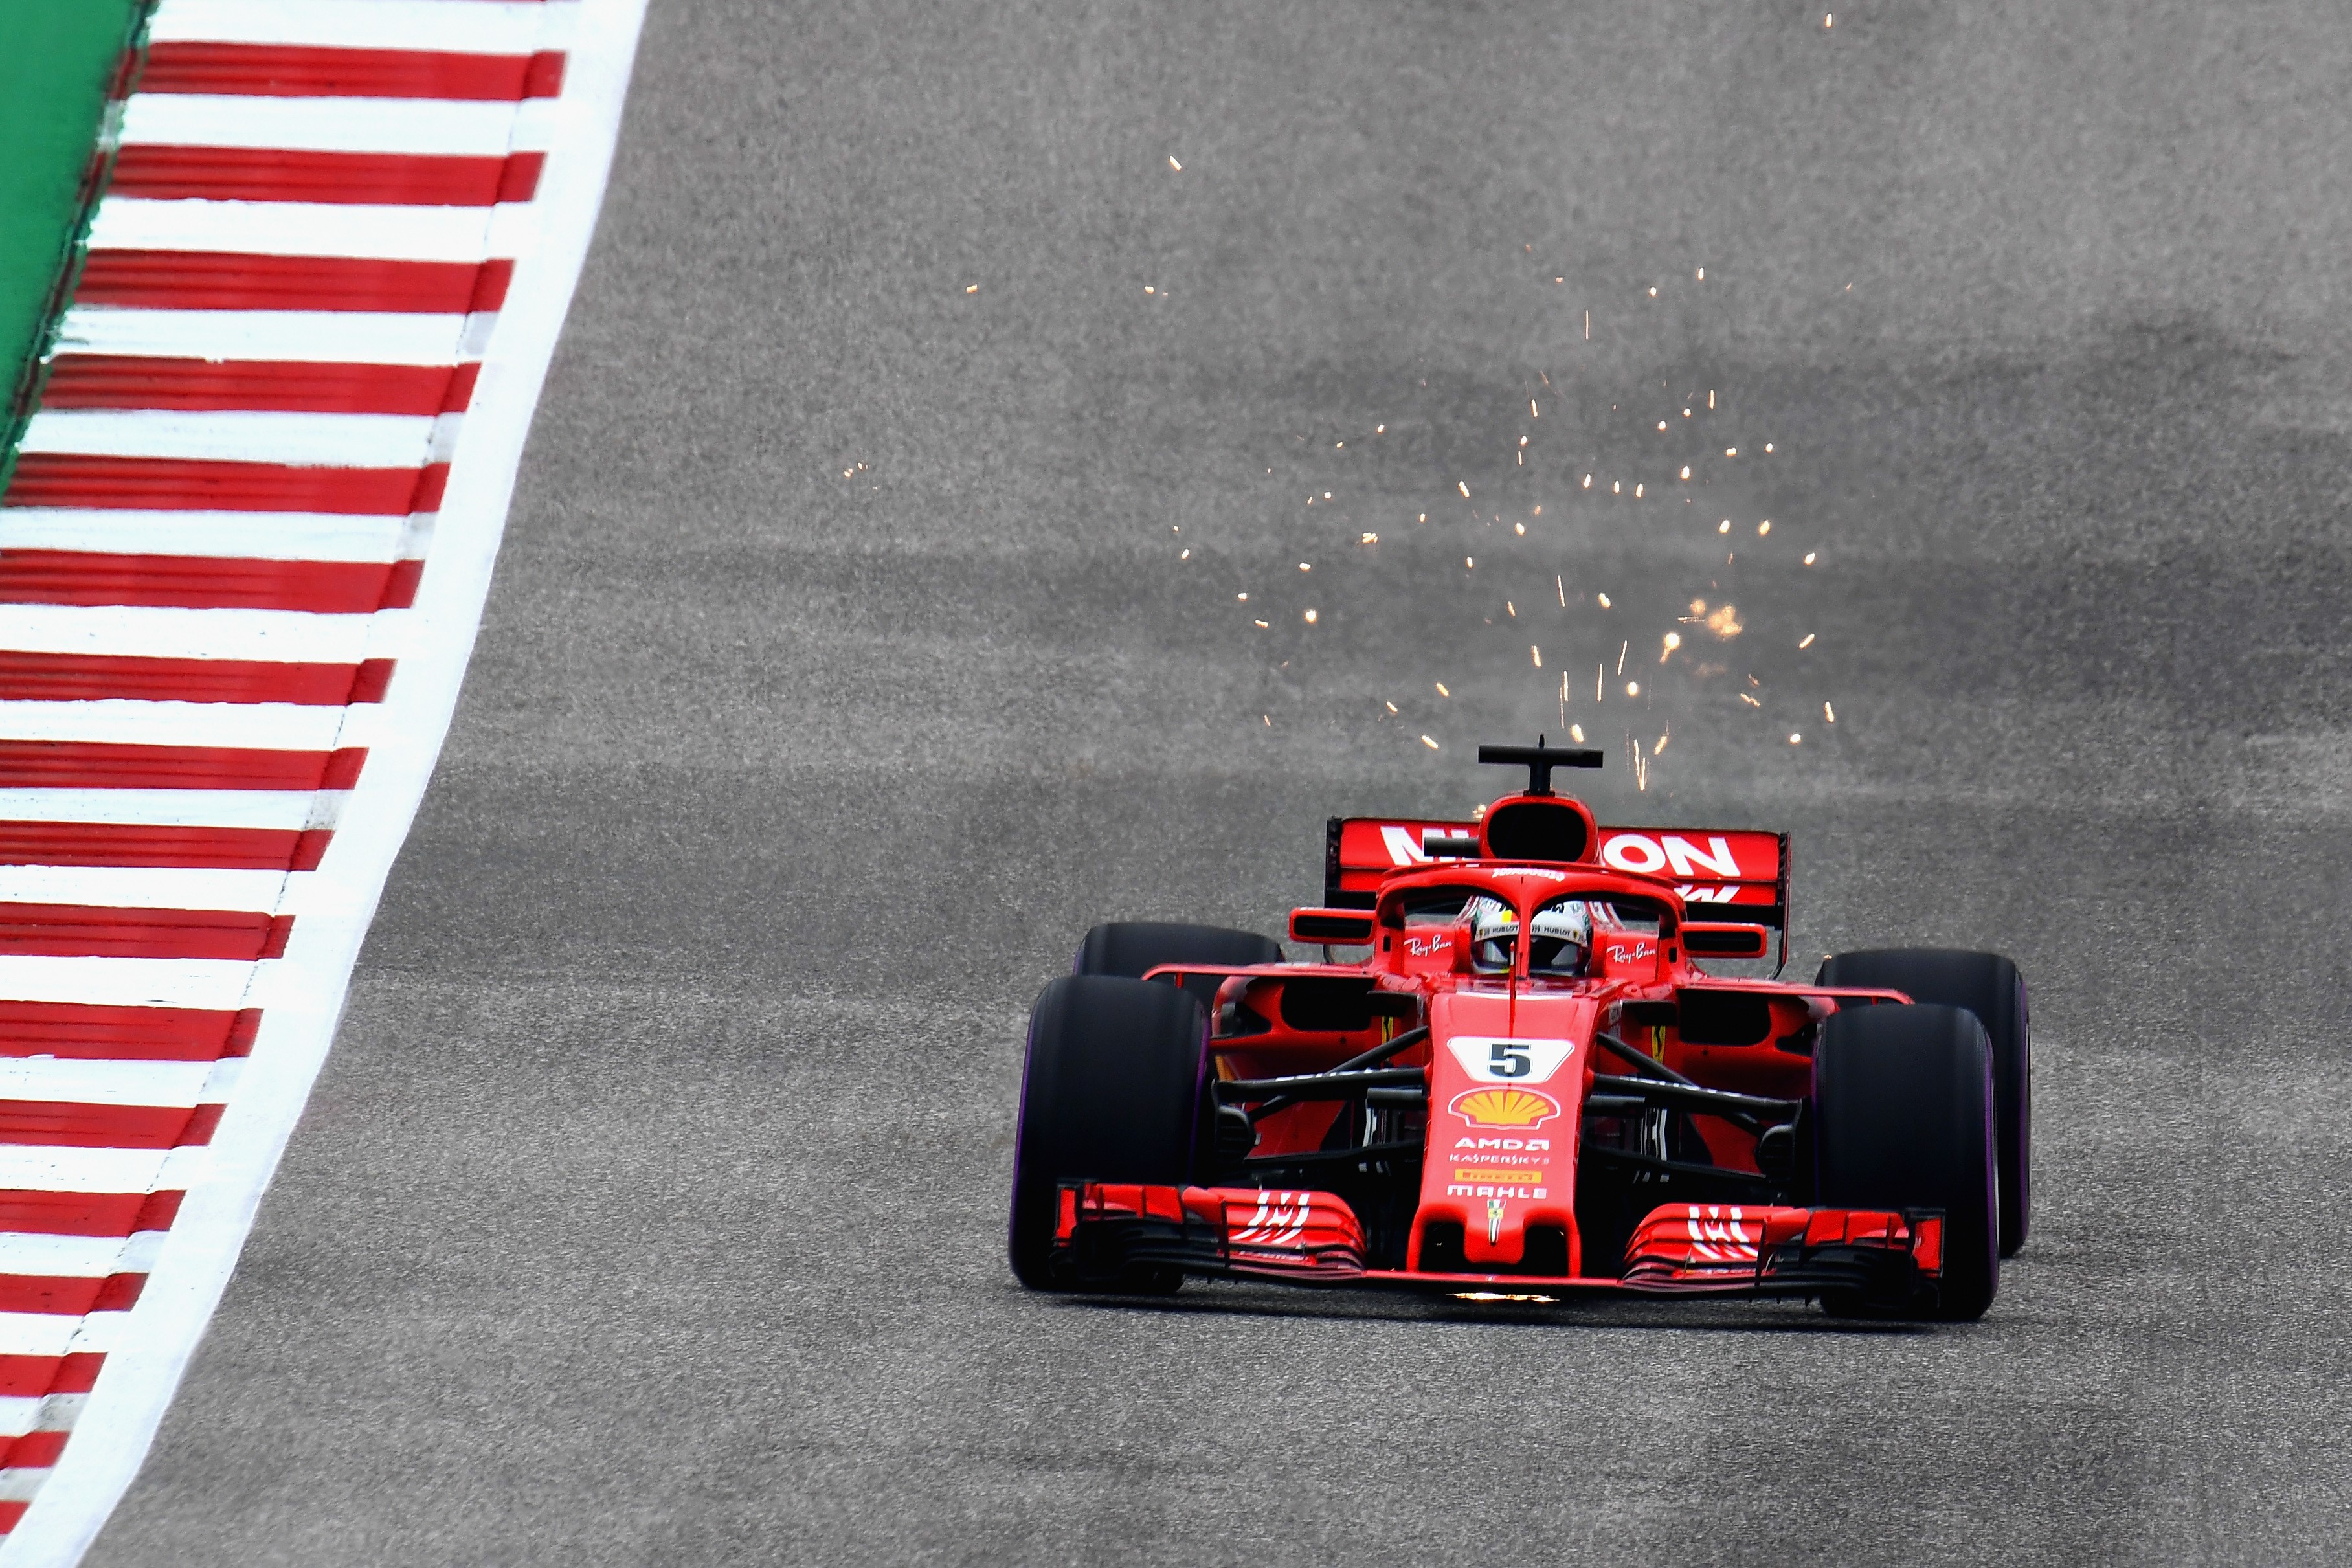 Sebastian Vettel (Ferrari) au Grand Prix des Etats-Unis 2018